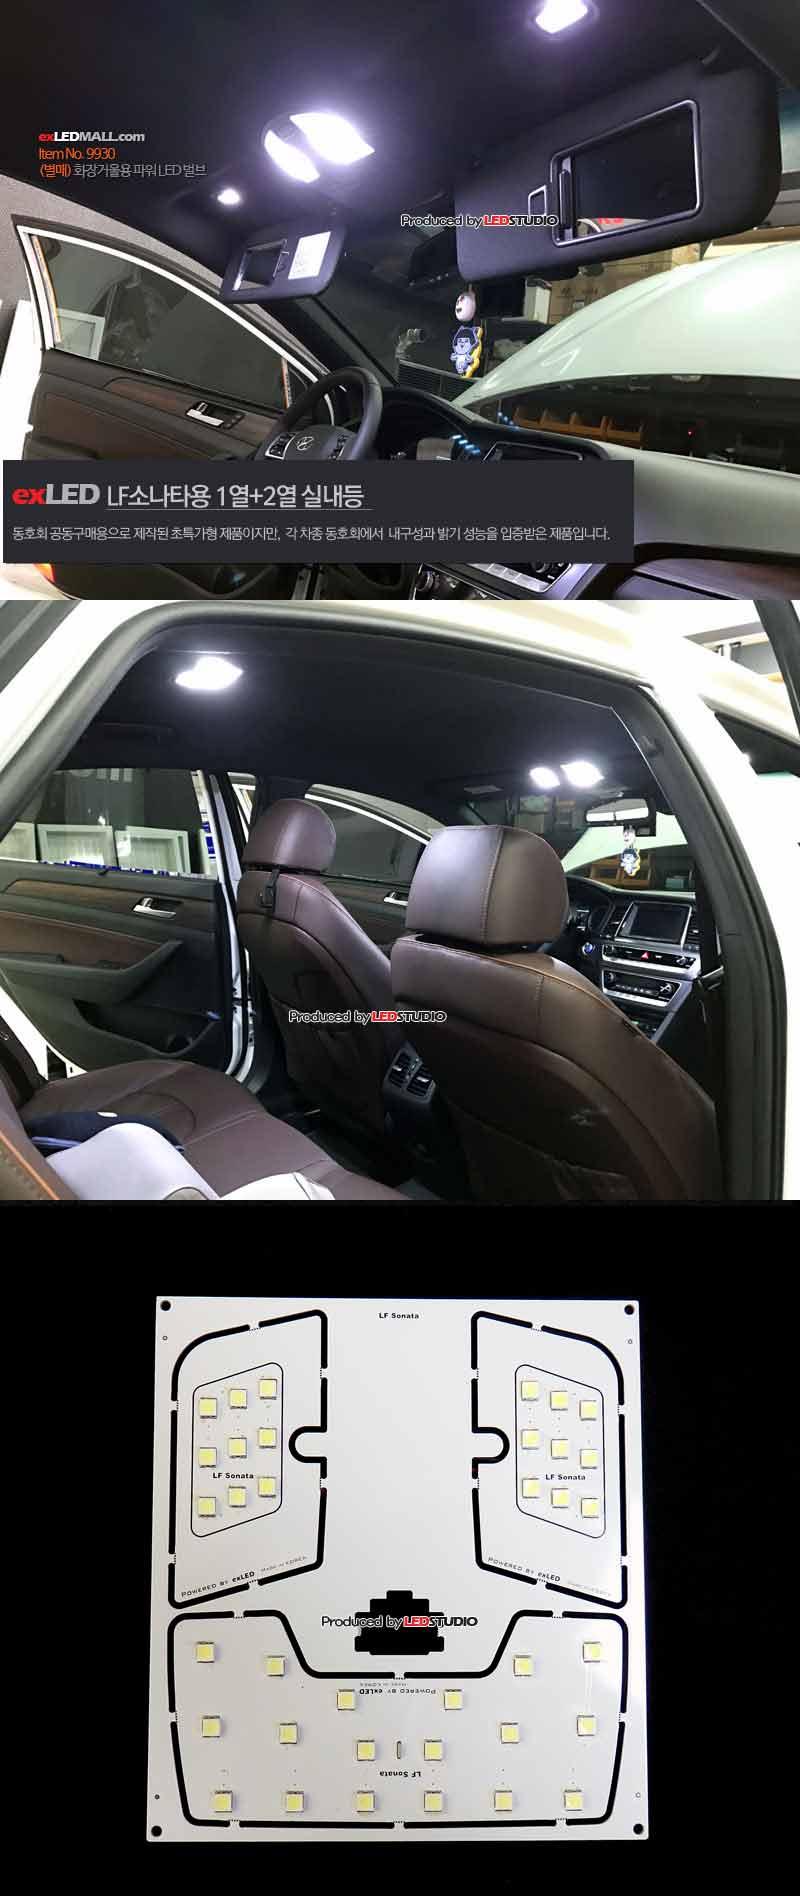 exLED LF 소나타용 실내등(1열+2열) (노말 차량용/공동구매형)